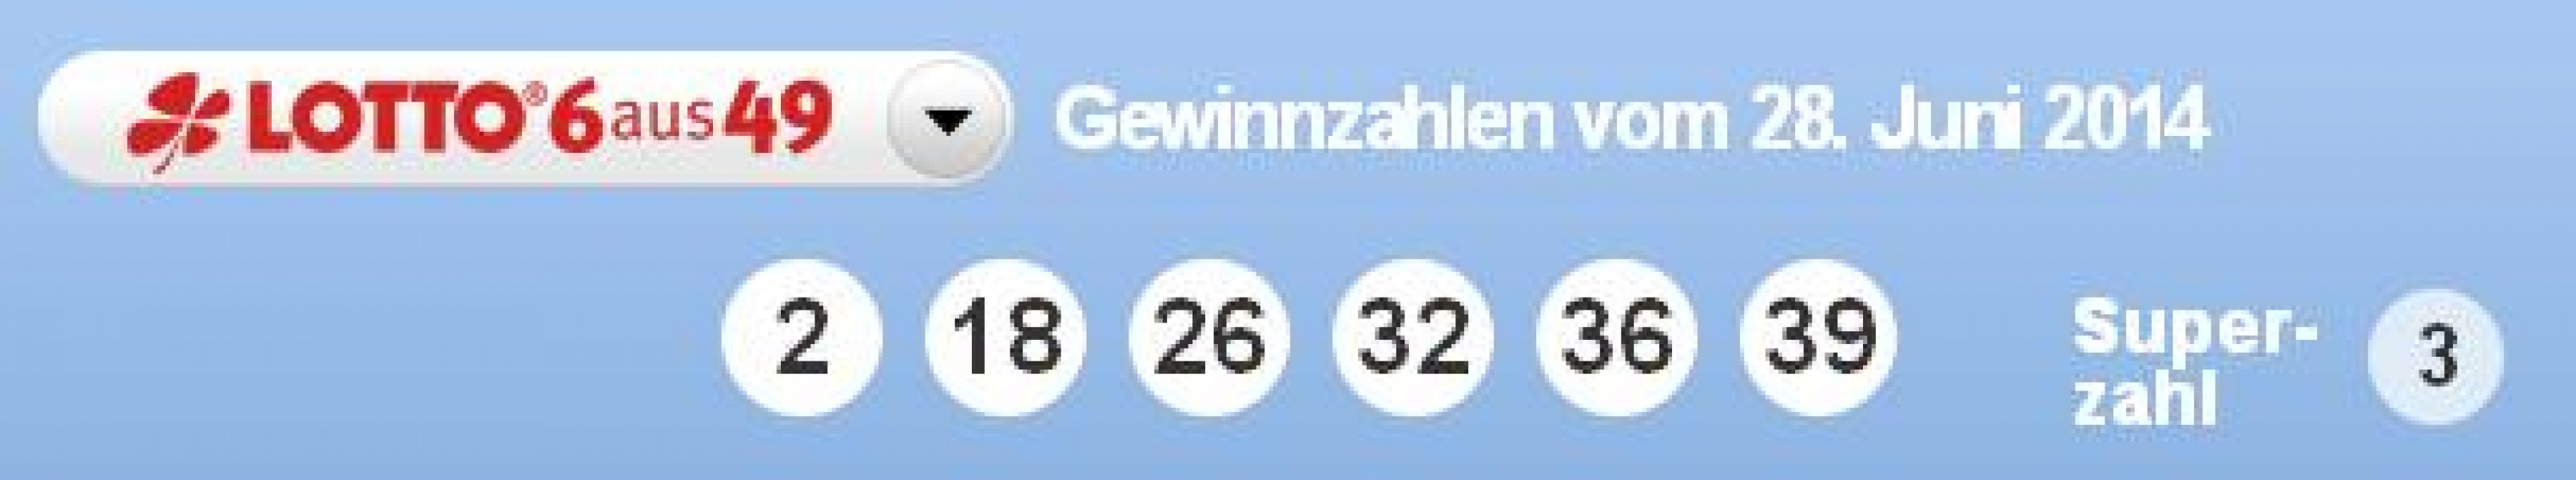 loteria germana